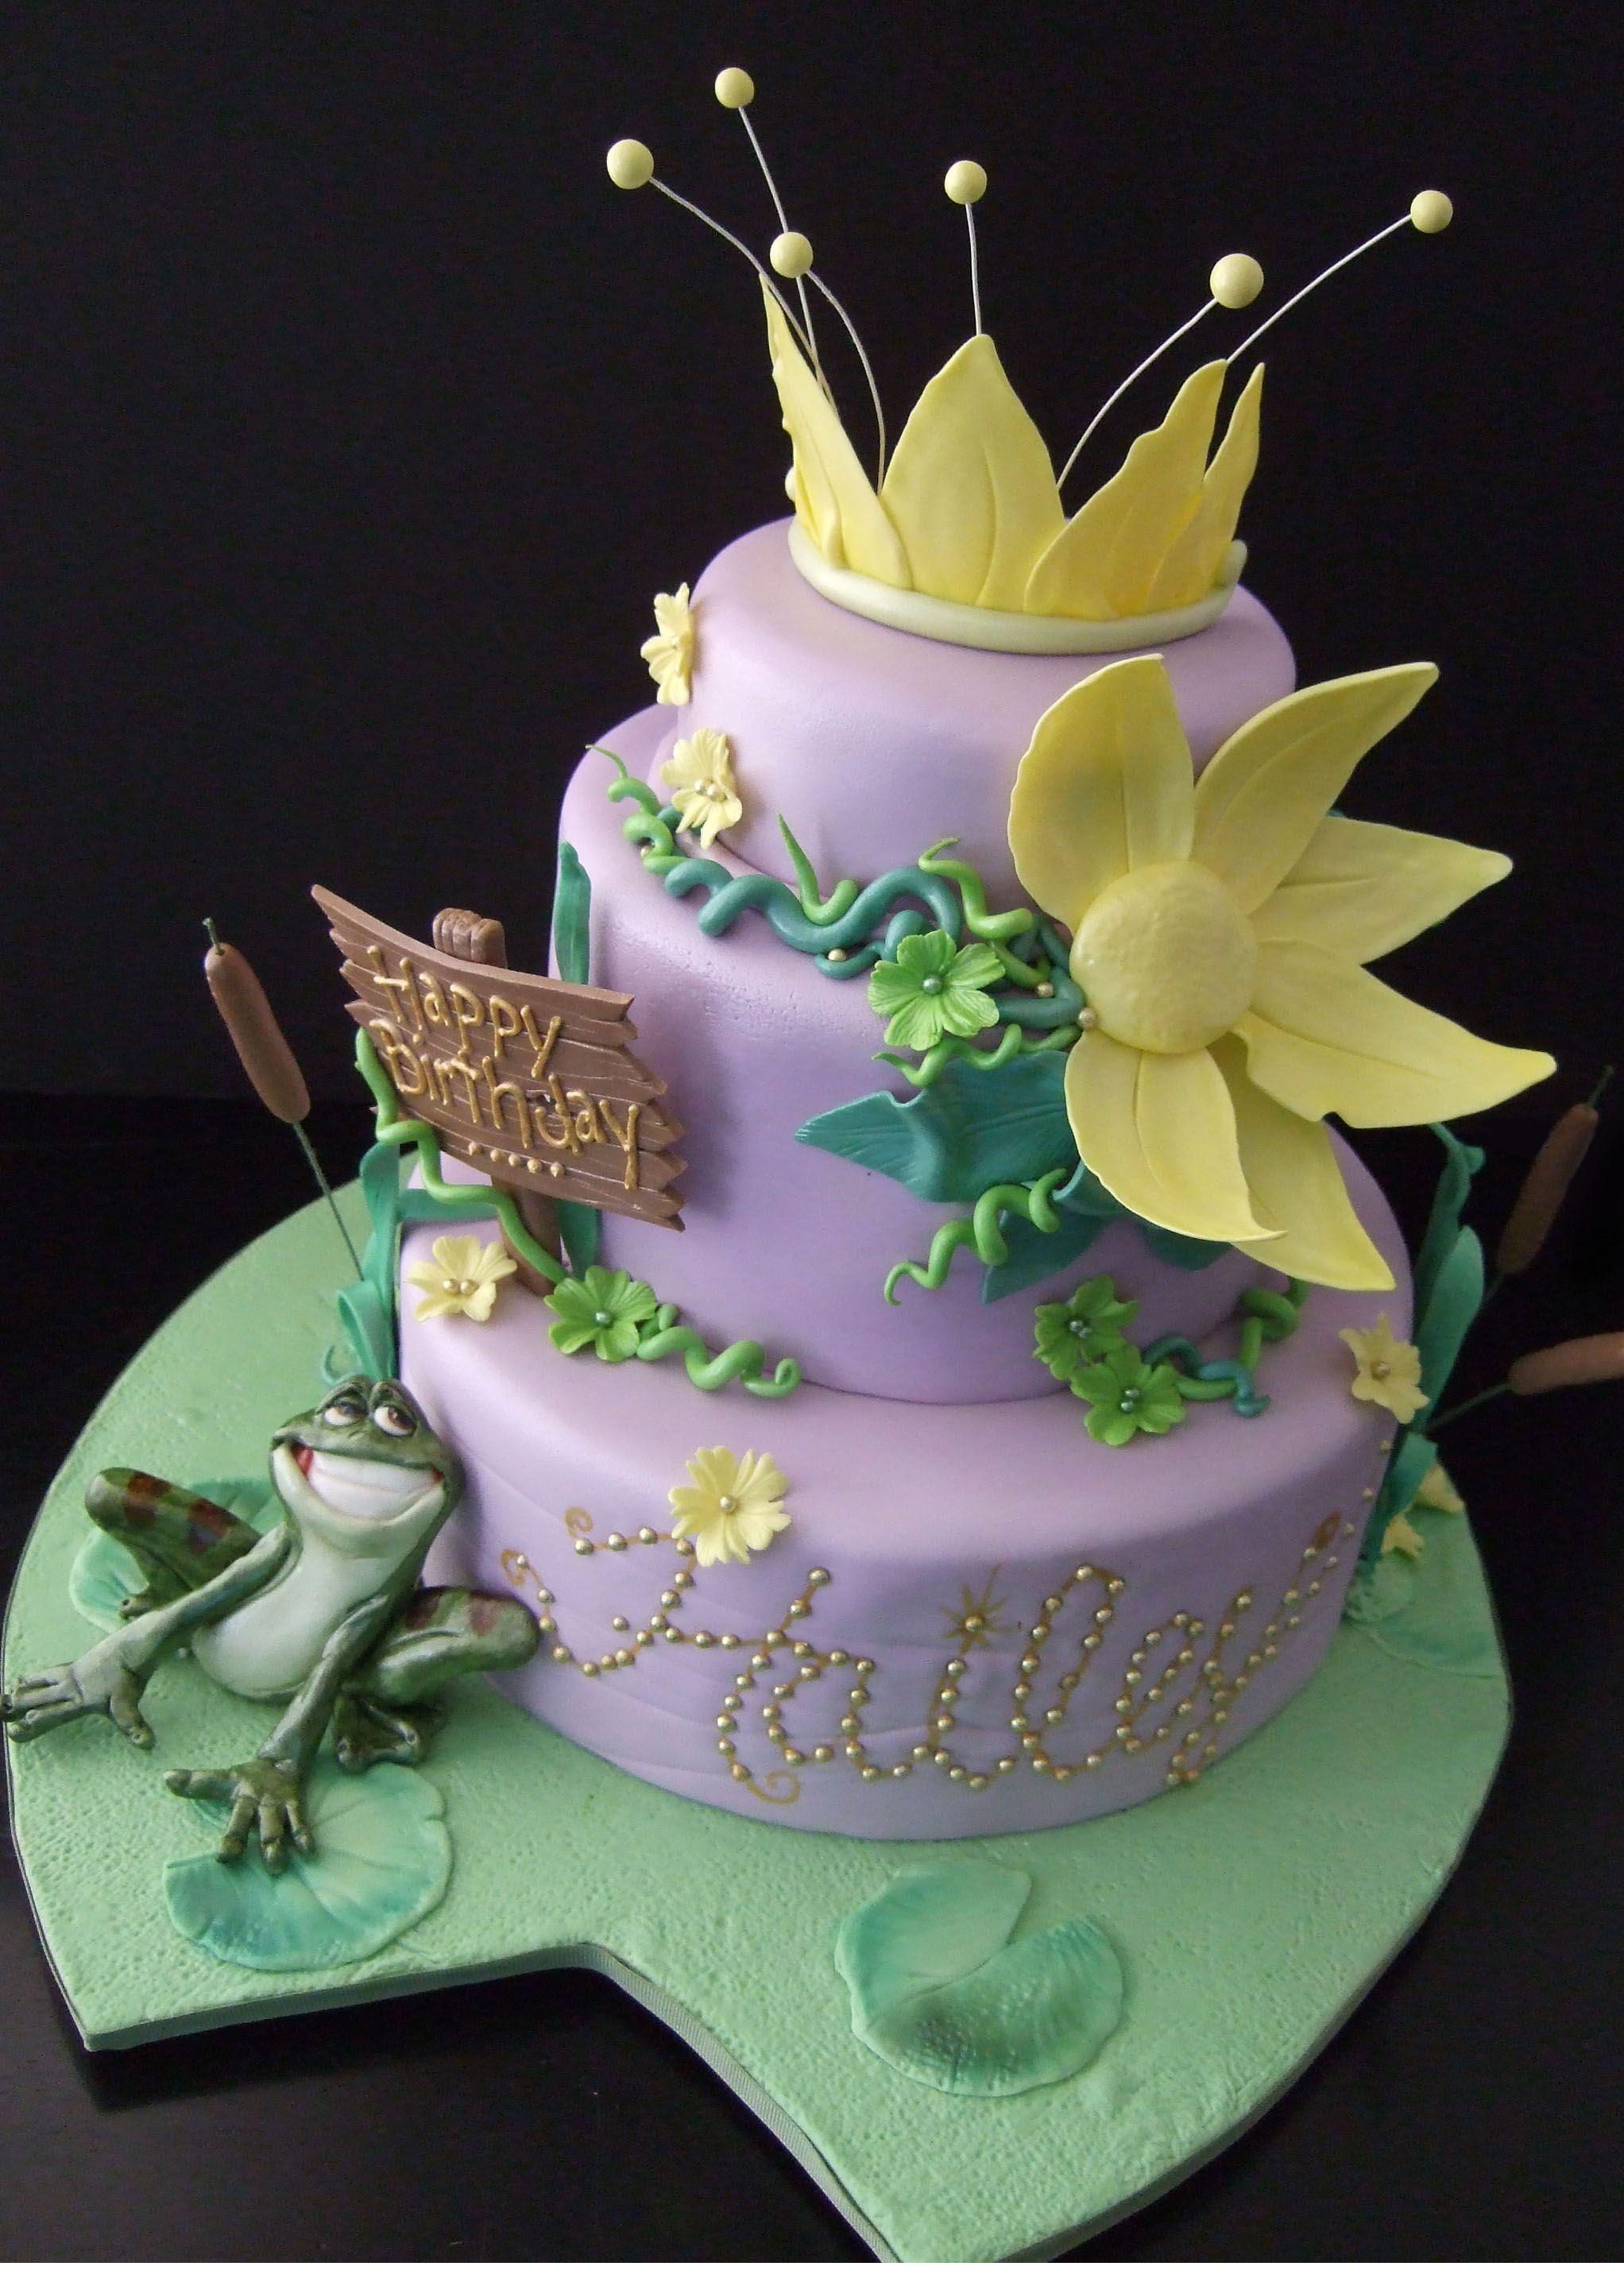 Princess The Frog Themed Cake Fondant Frog Lily Pad Crown